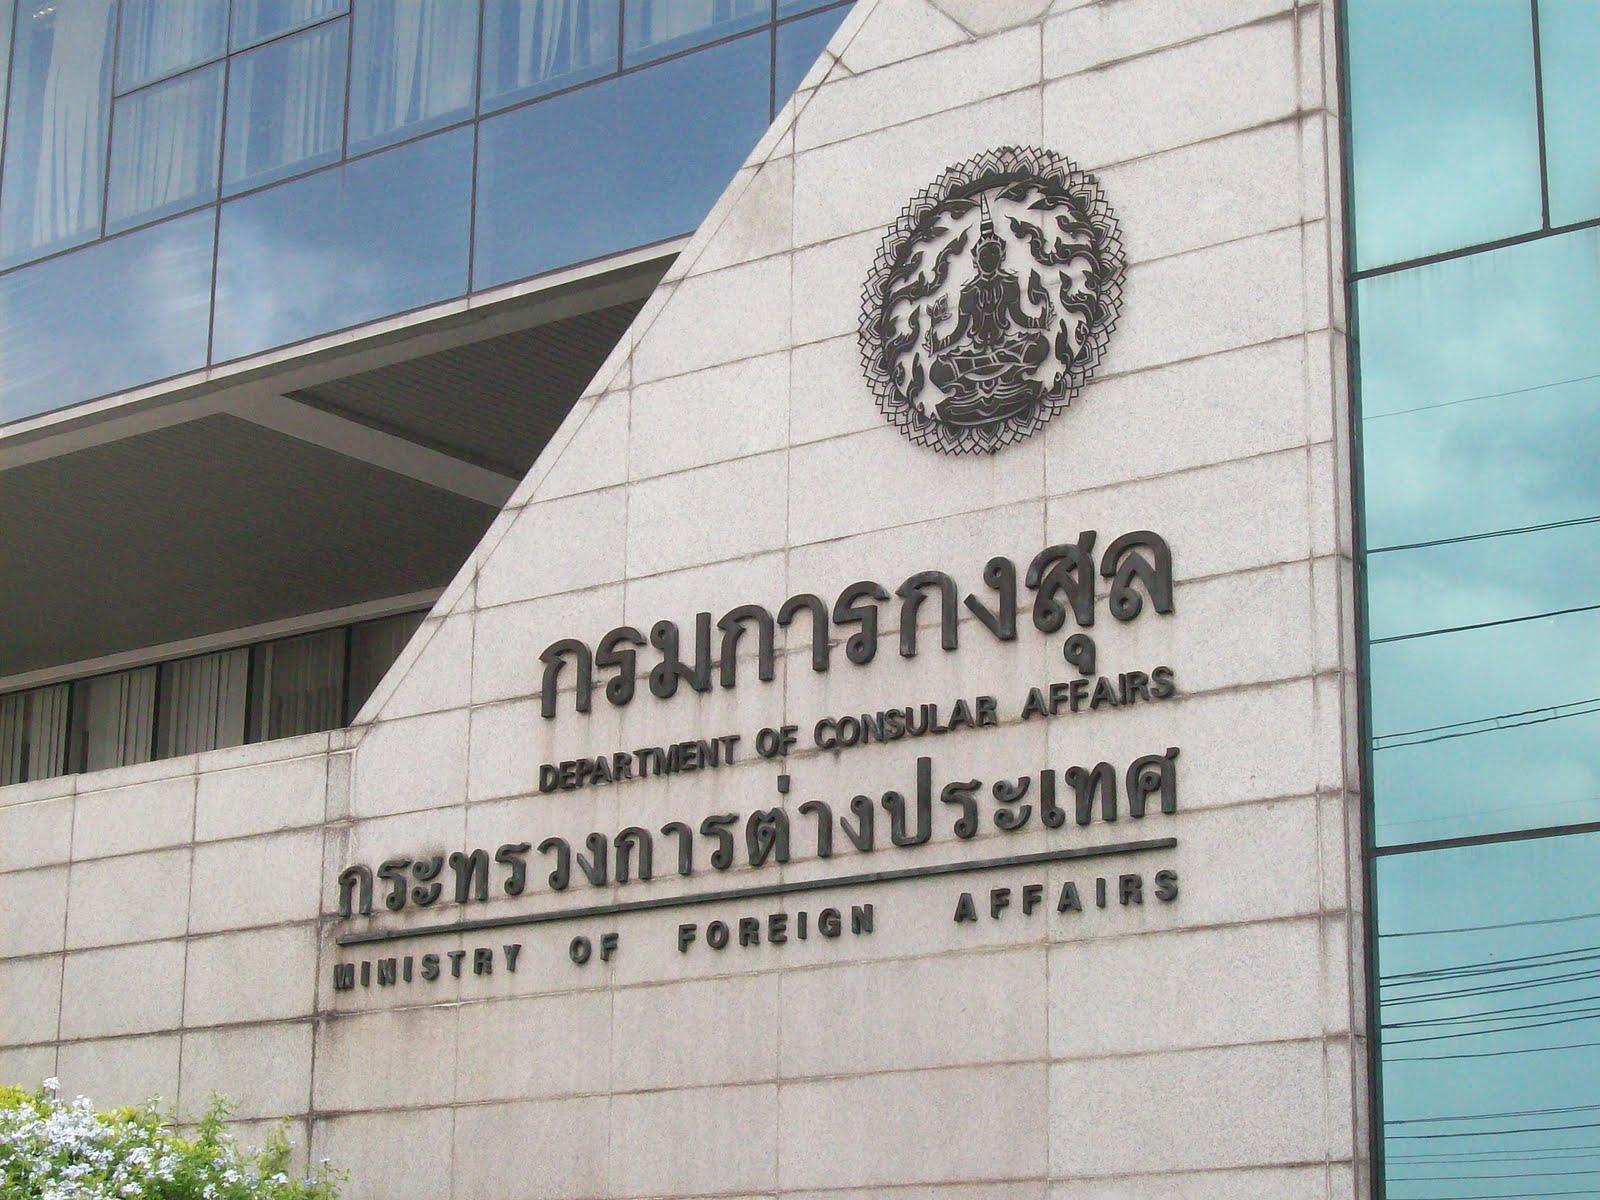 Thai Single Entry Business Visa